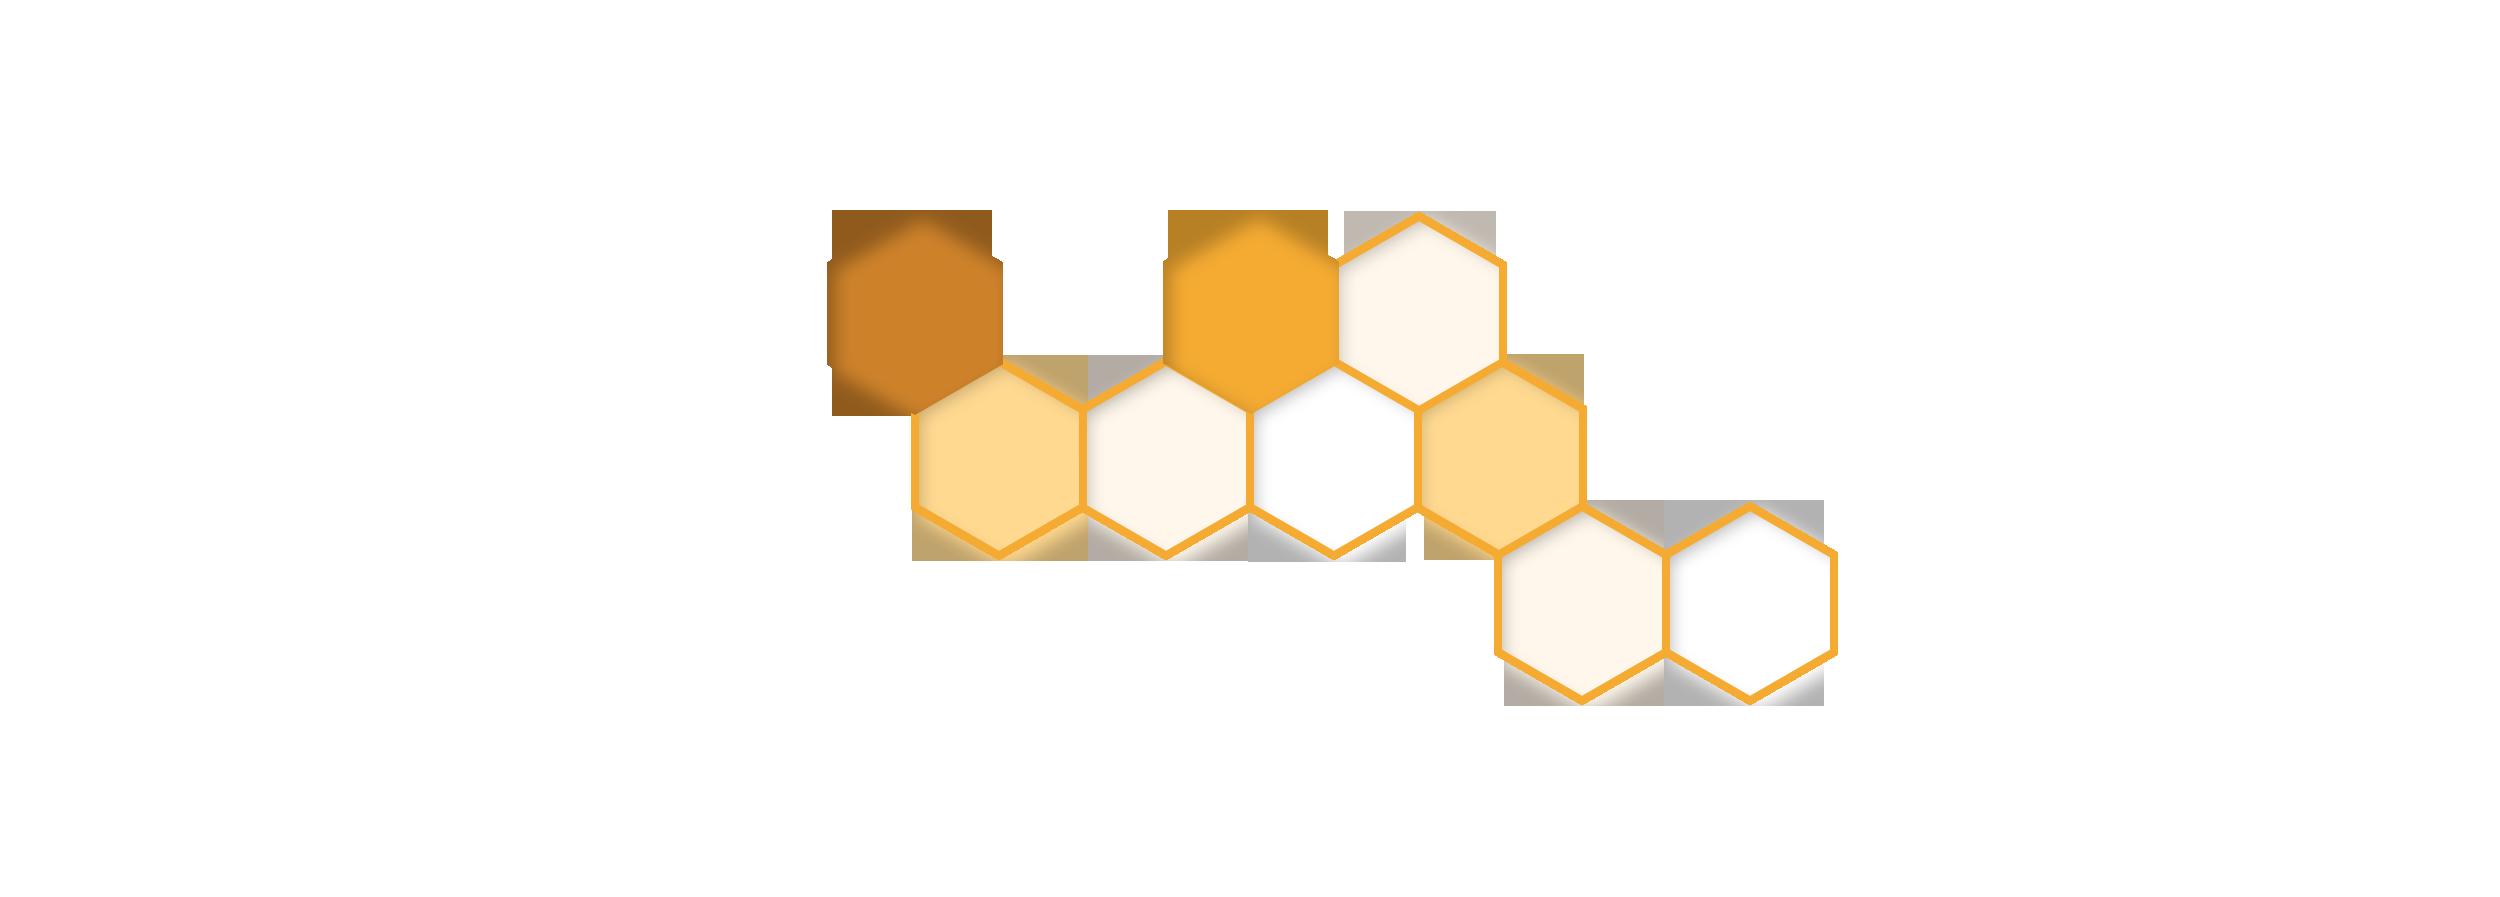 honeycomb_c6.png